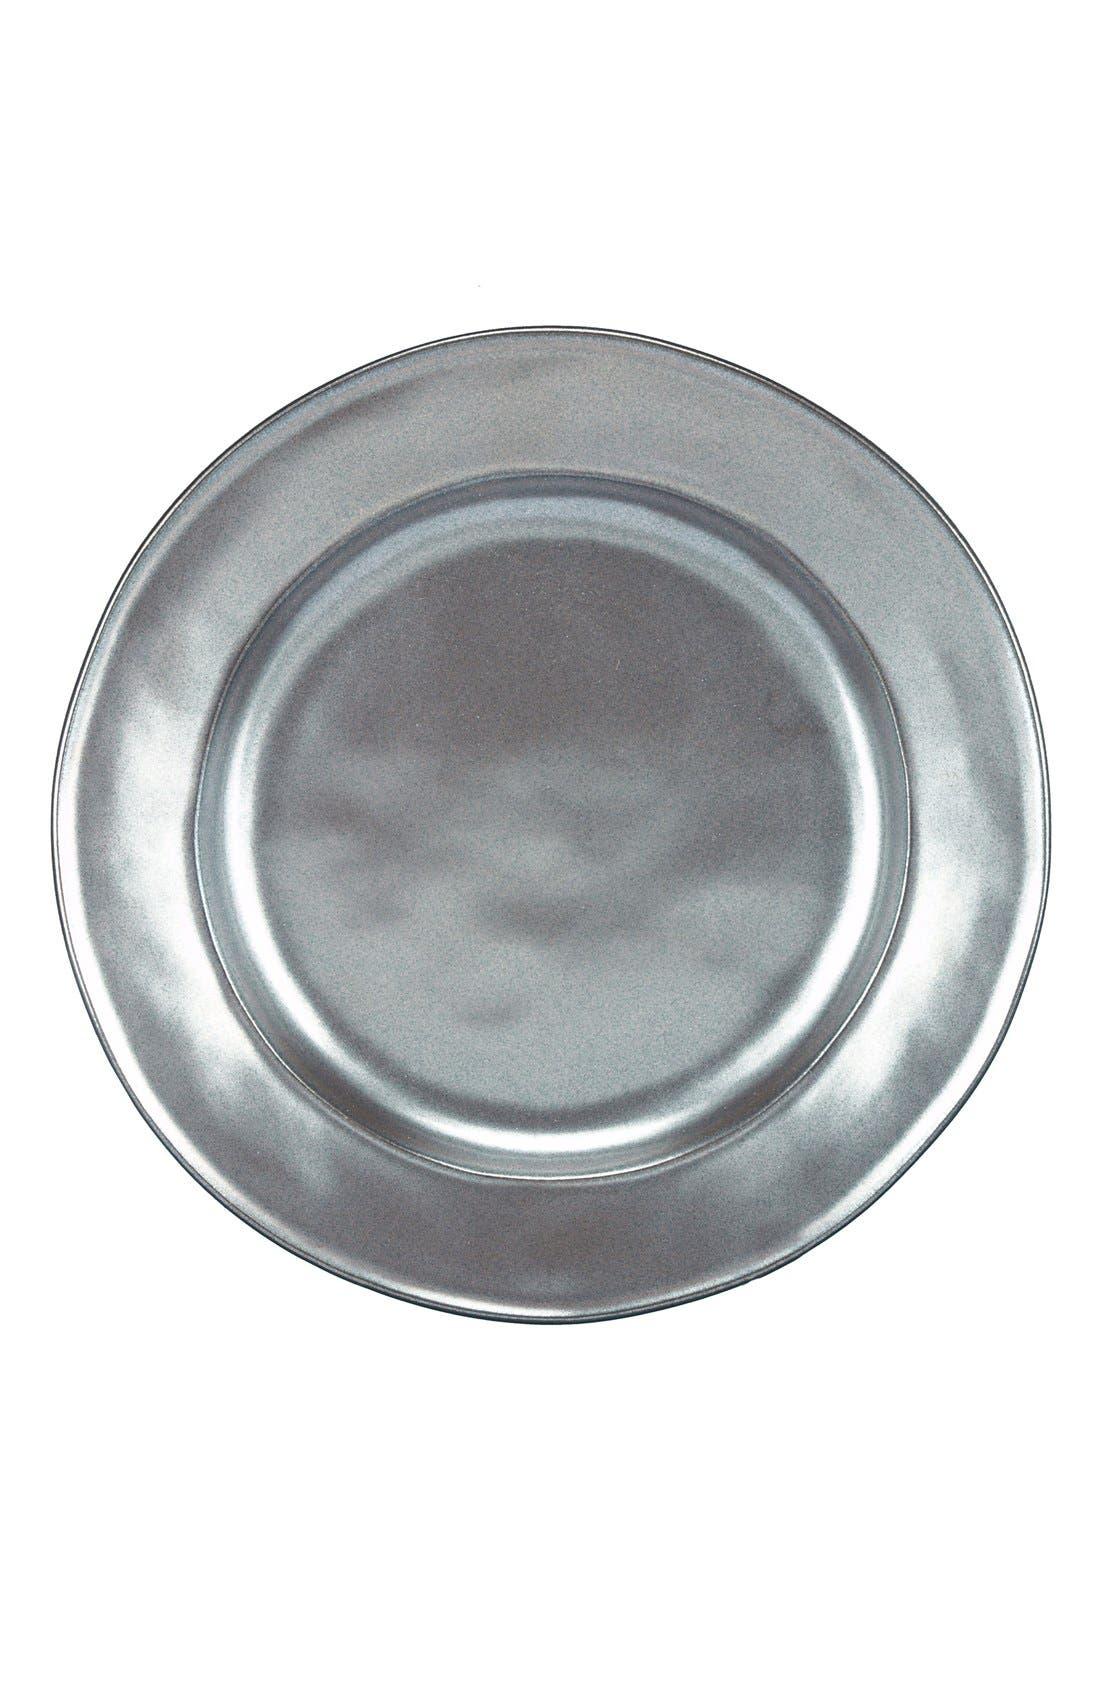 'Pewter' Ceramic Salad Plate,                         Main,                         color, PEWTER